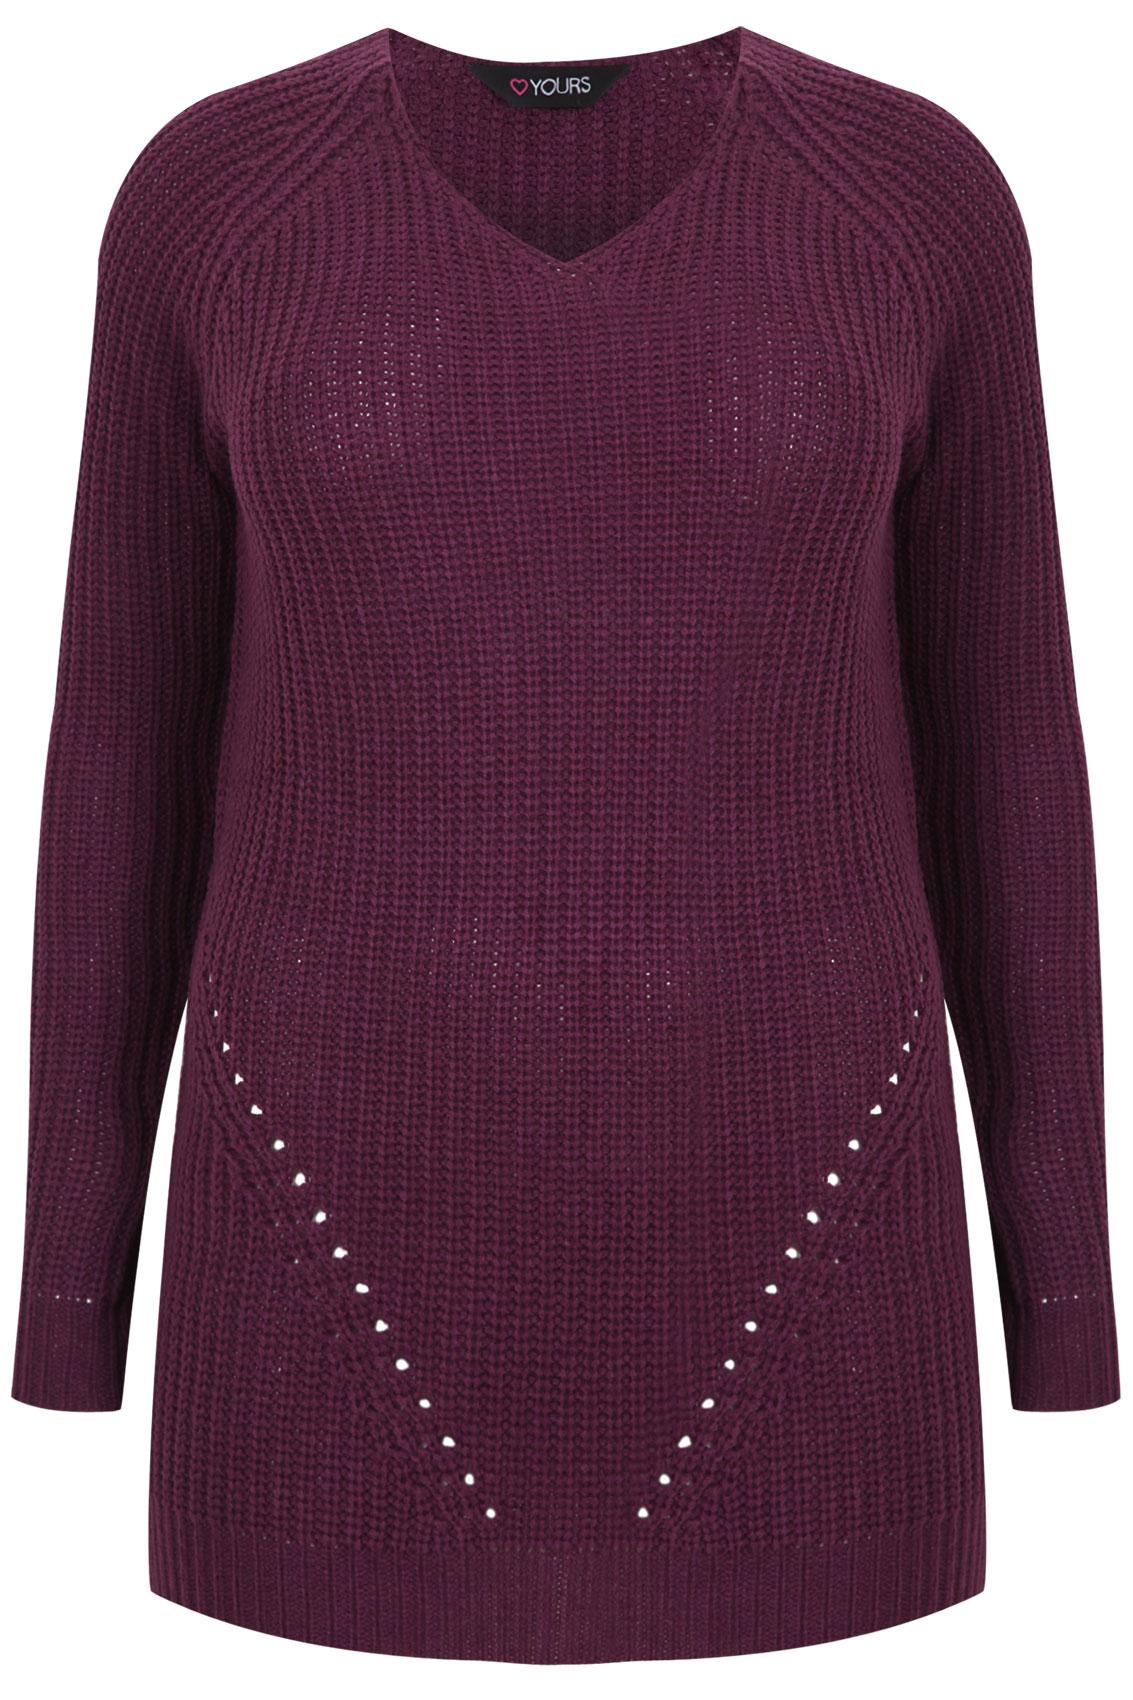 Purple Longline Knitted V Neck Jumper Plus size 16,18,20,22,24,26,28,30,32,34,36